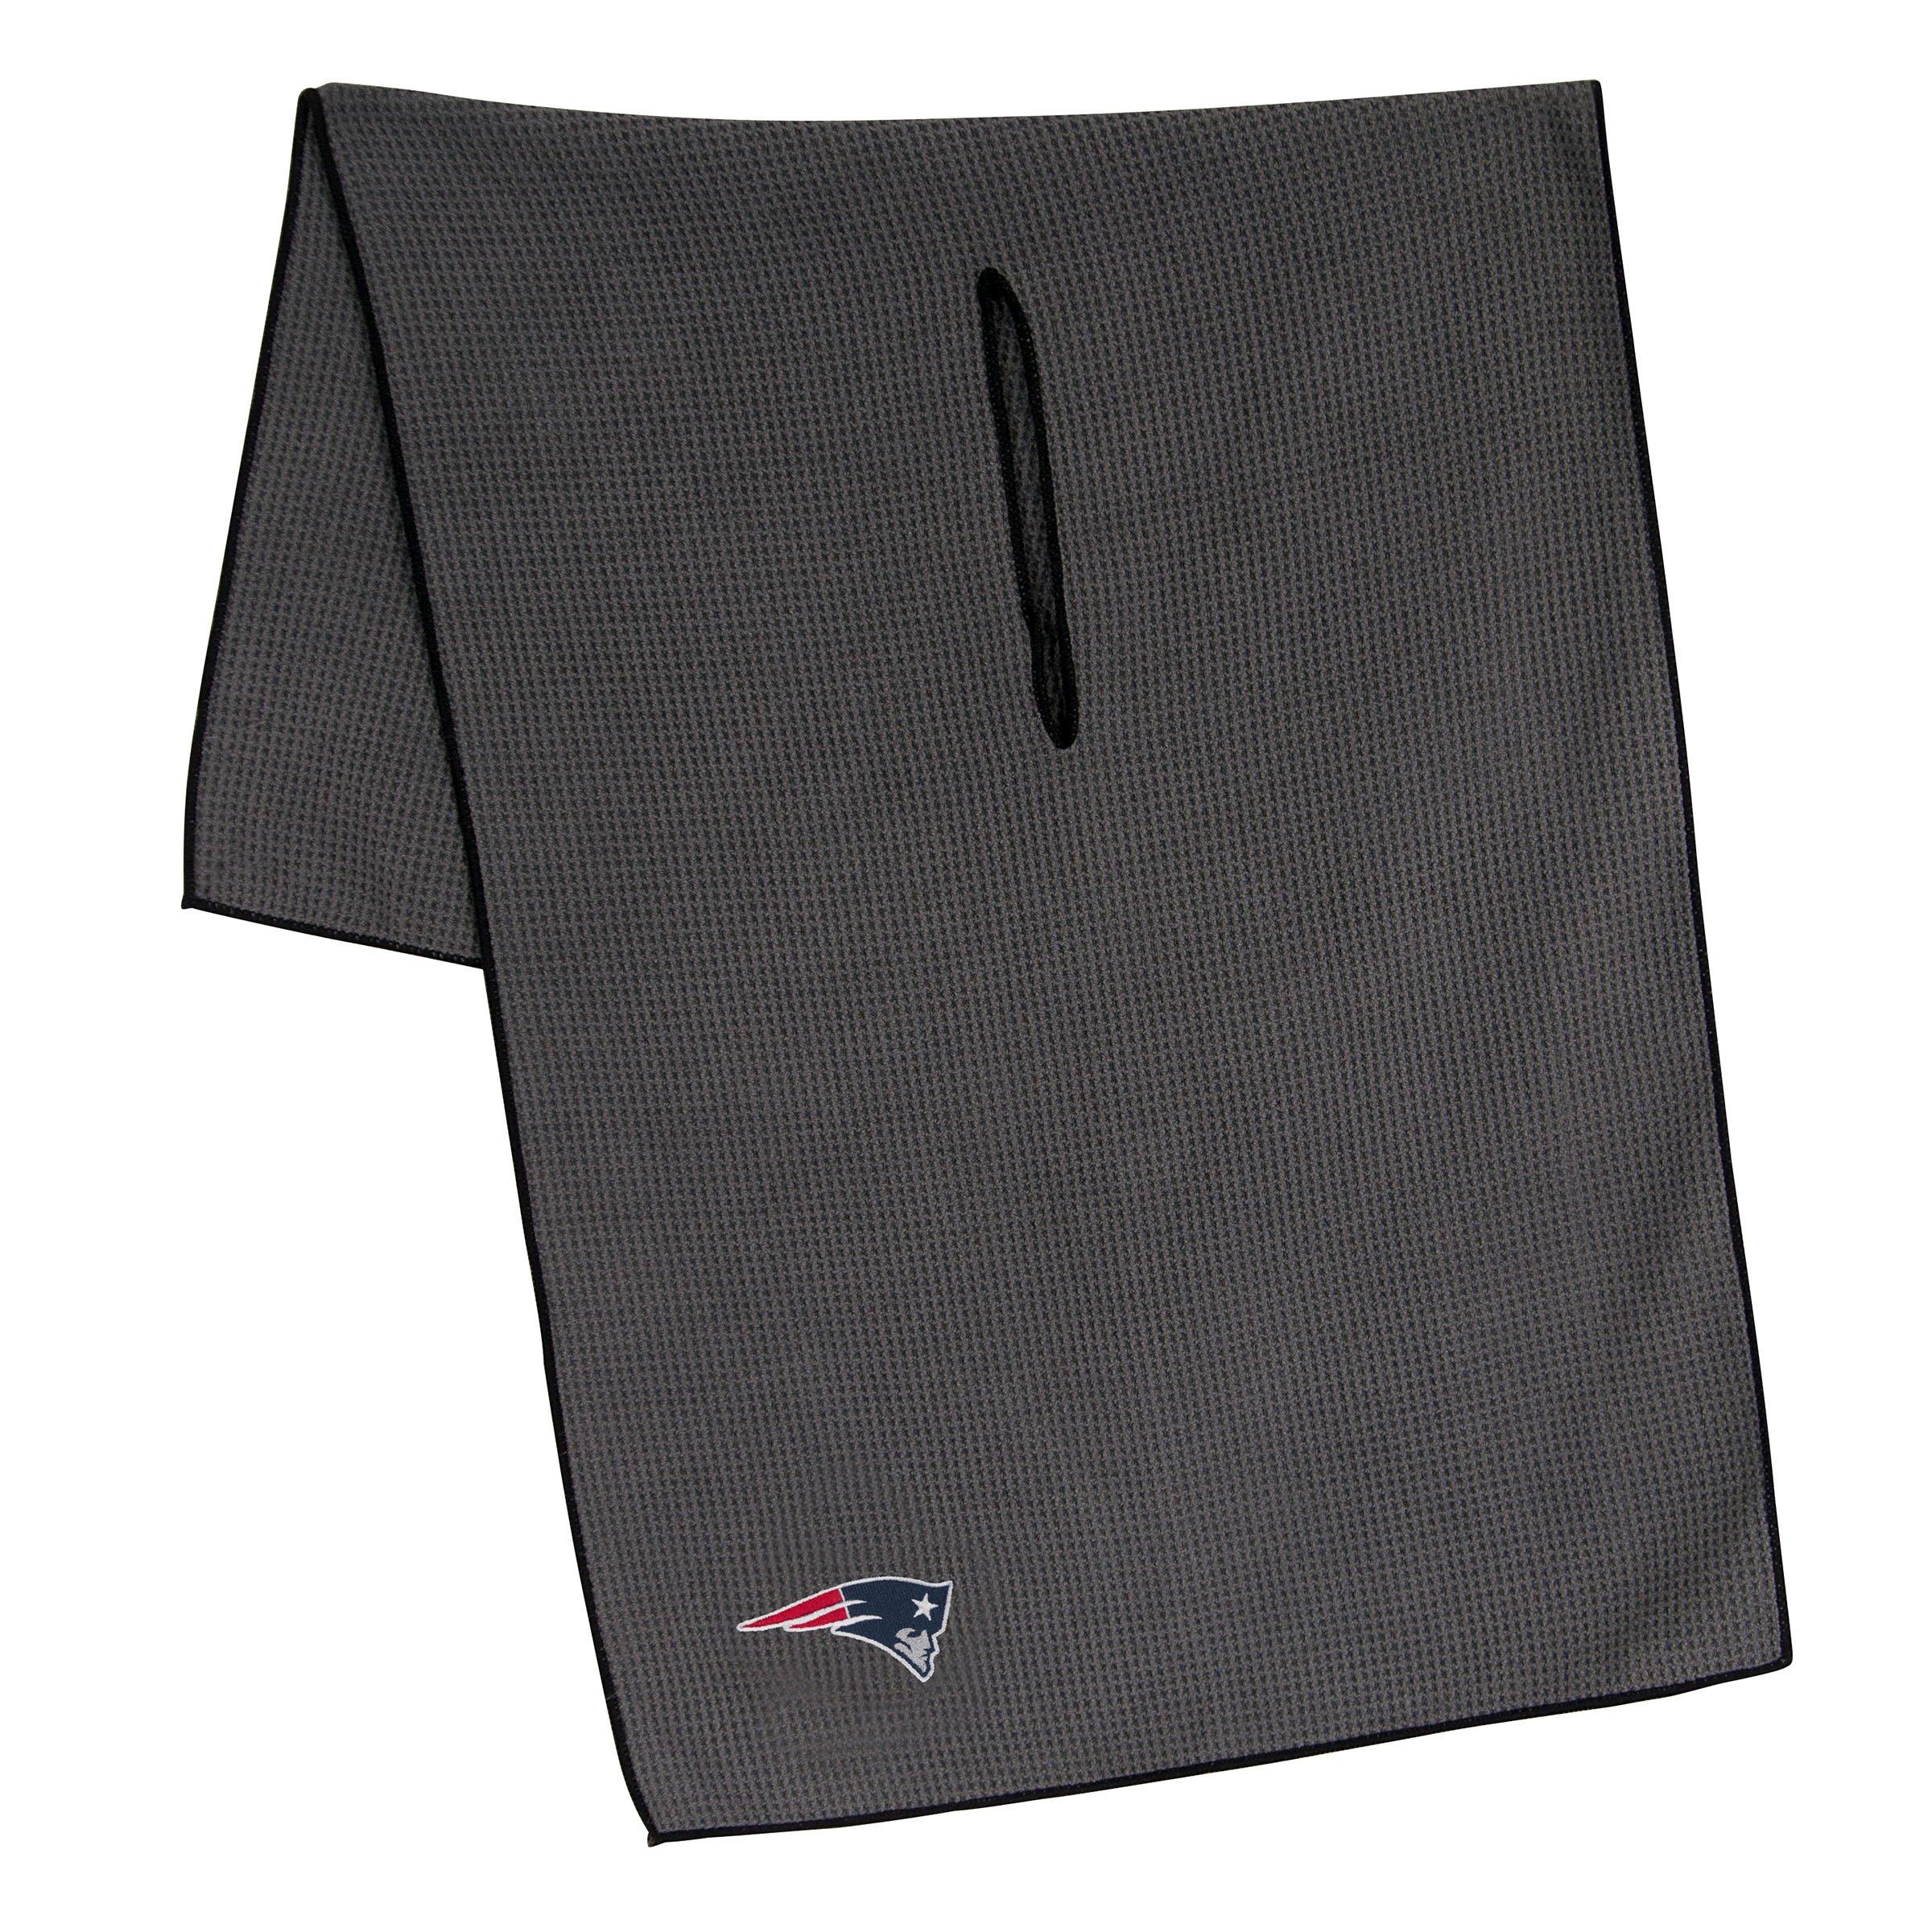 Team Effort NFL New England Patriots 19''x41'' Grey Microfiber Towel by Team Effort